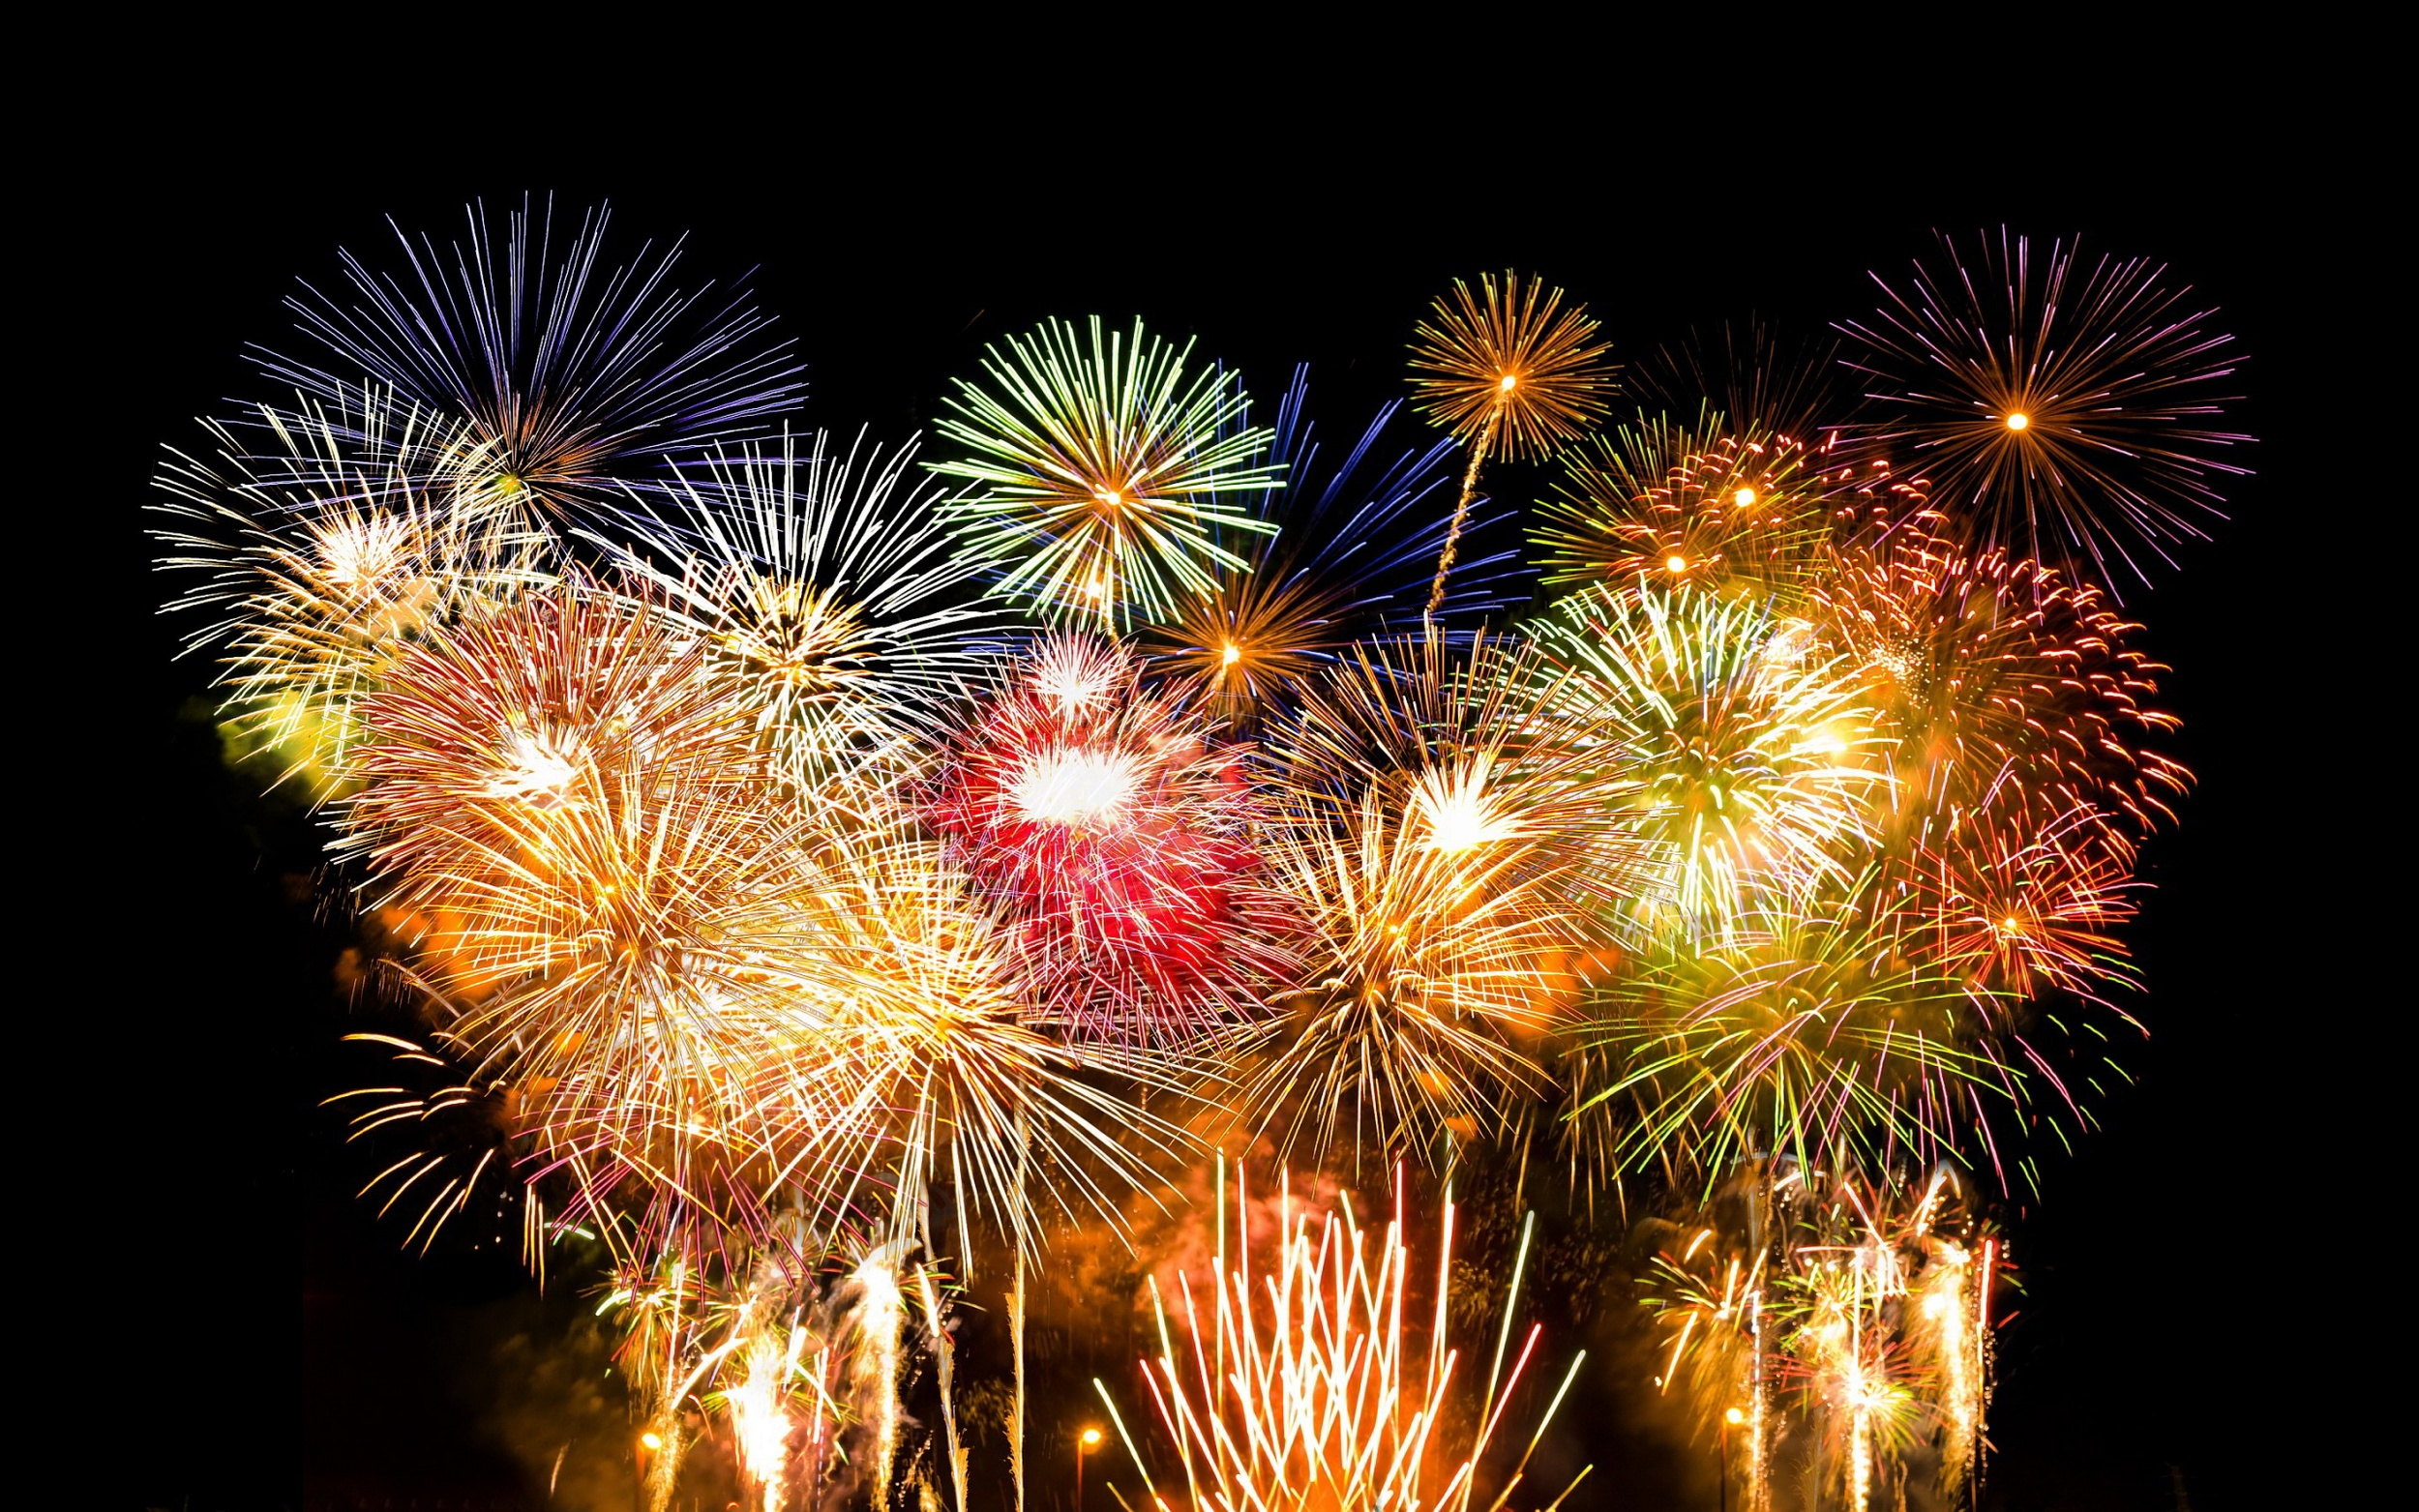 colored-fireworks-2560x1600.jpg